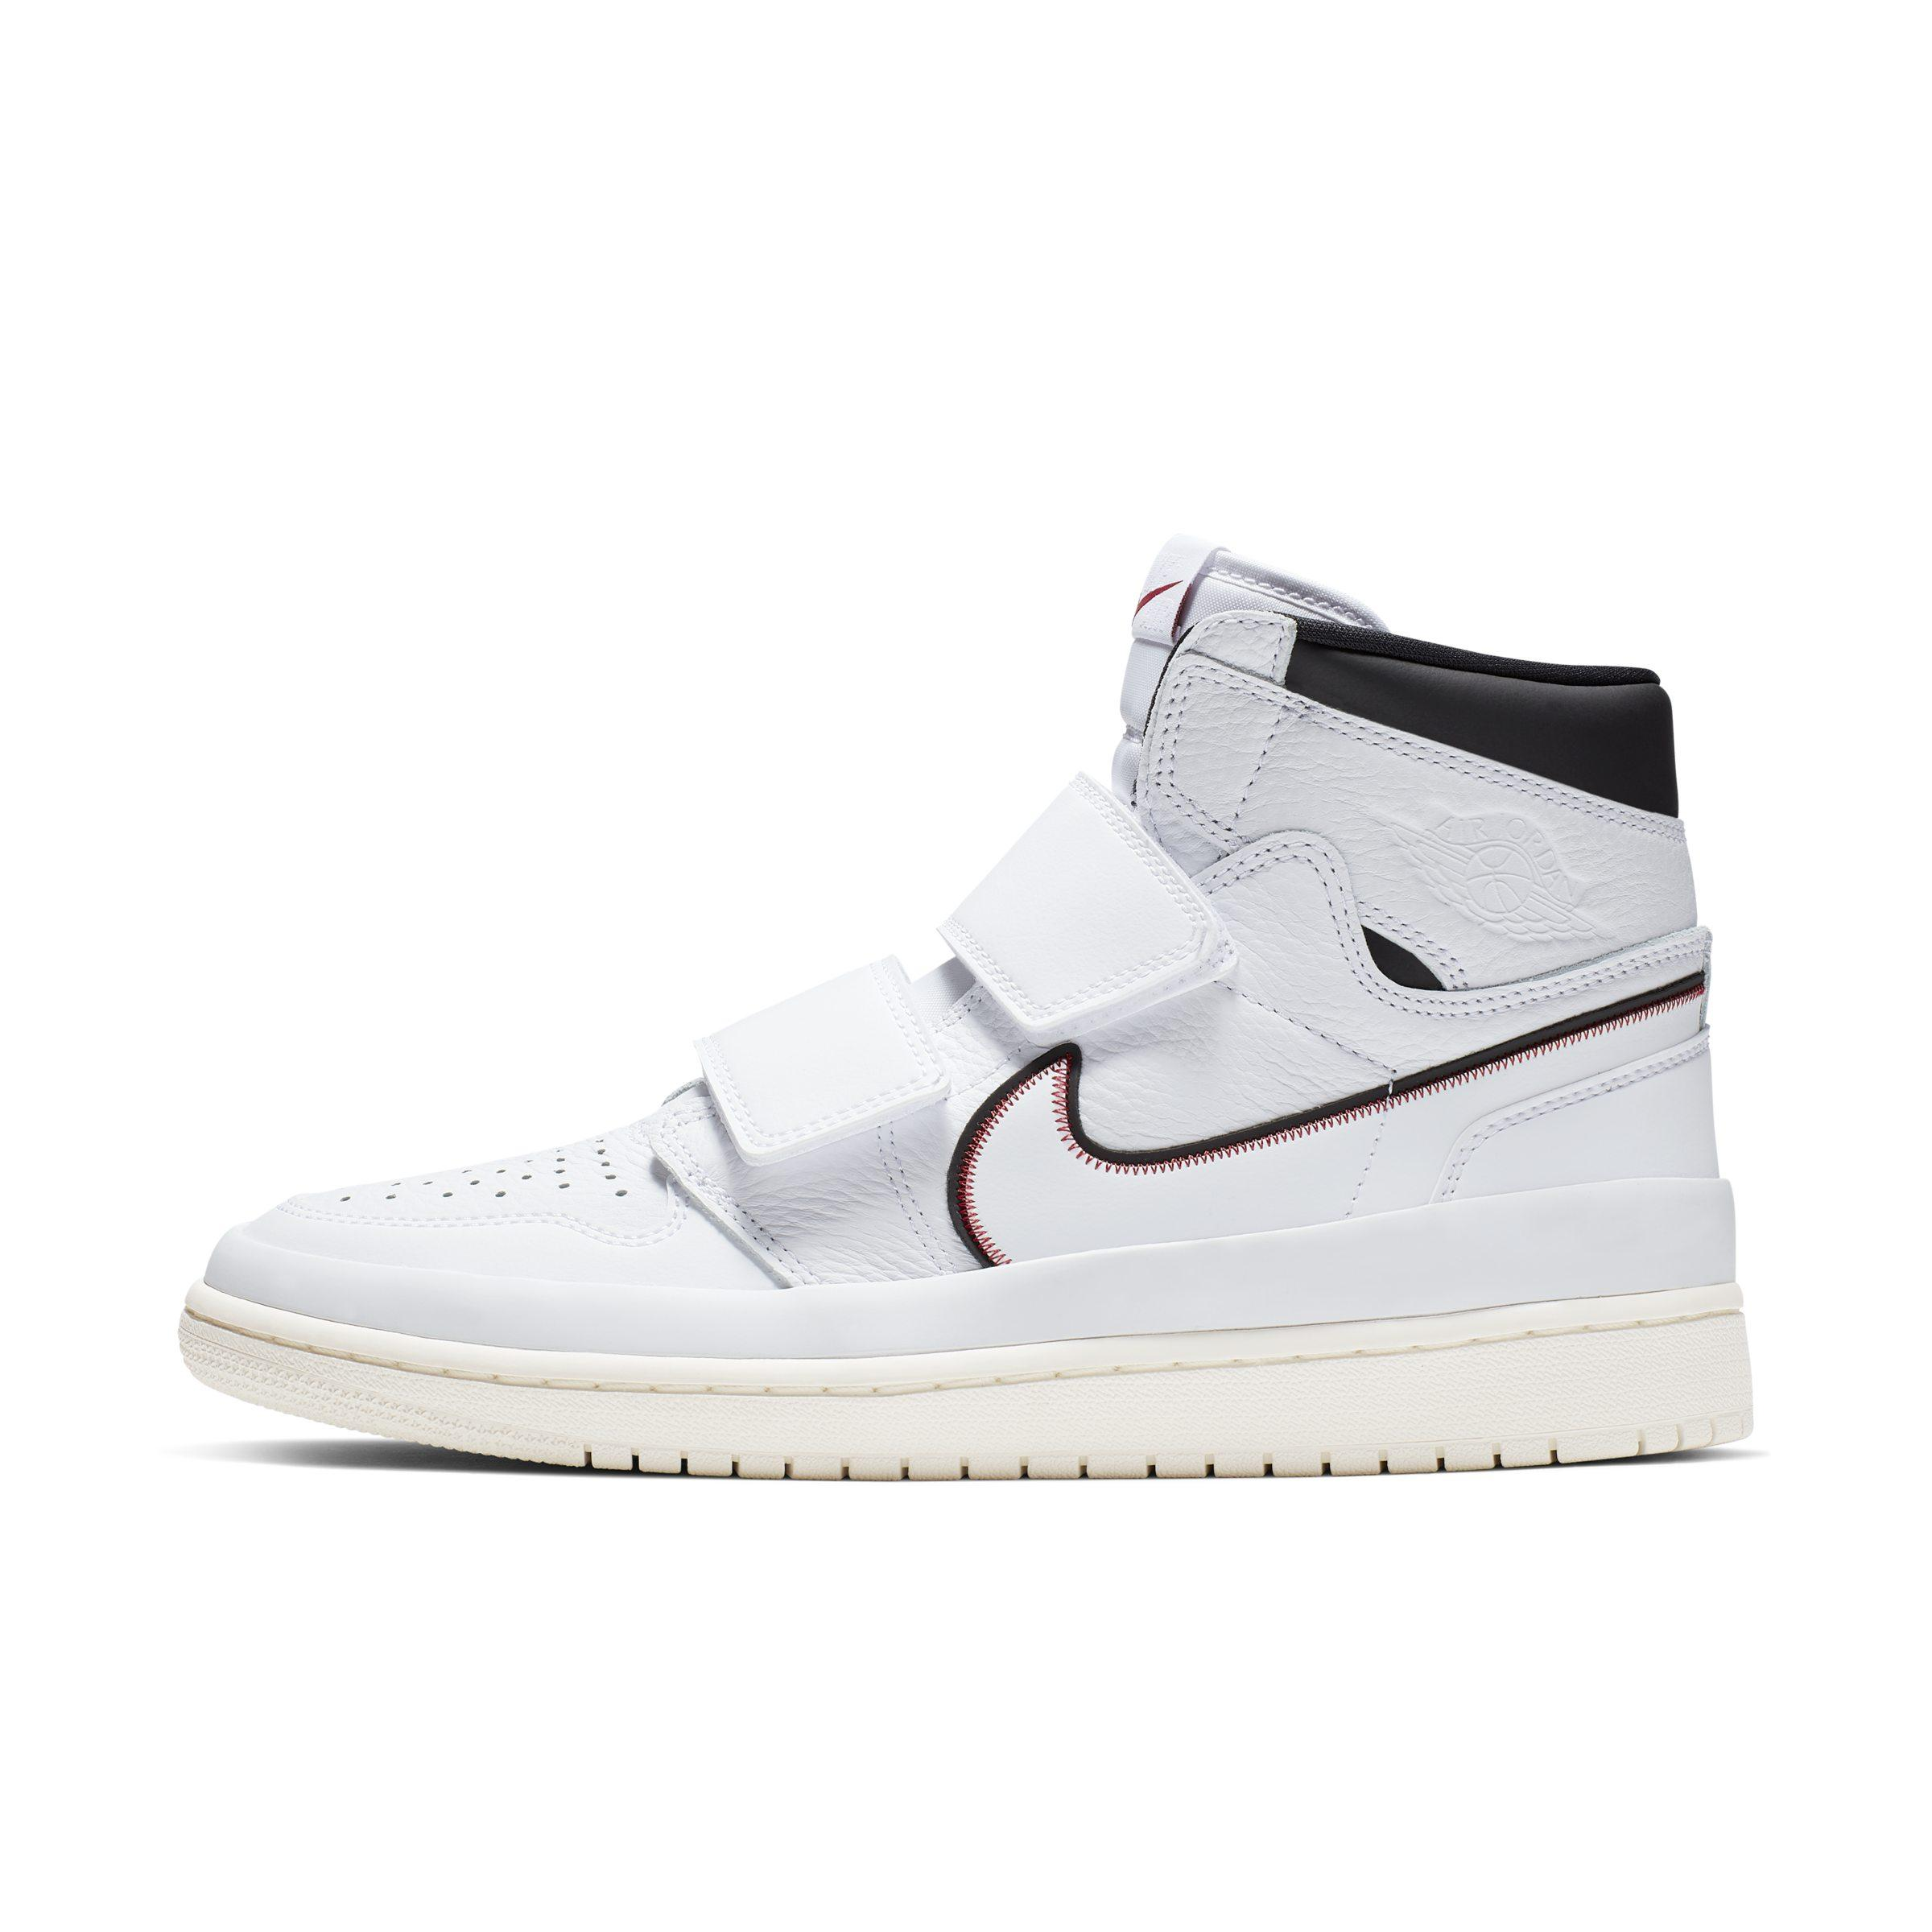 e79ff0c3694e18 Nike Air Jordan 1 Retro High Double-strap Shoe in White for Men - Lyst